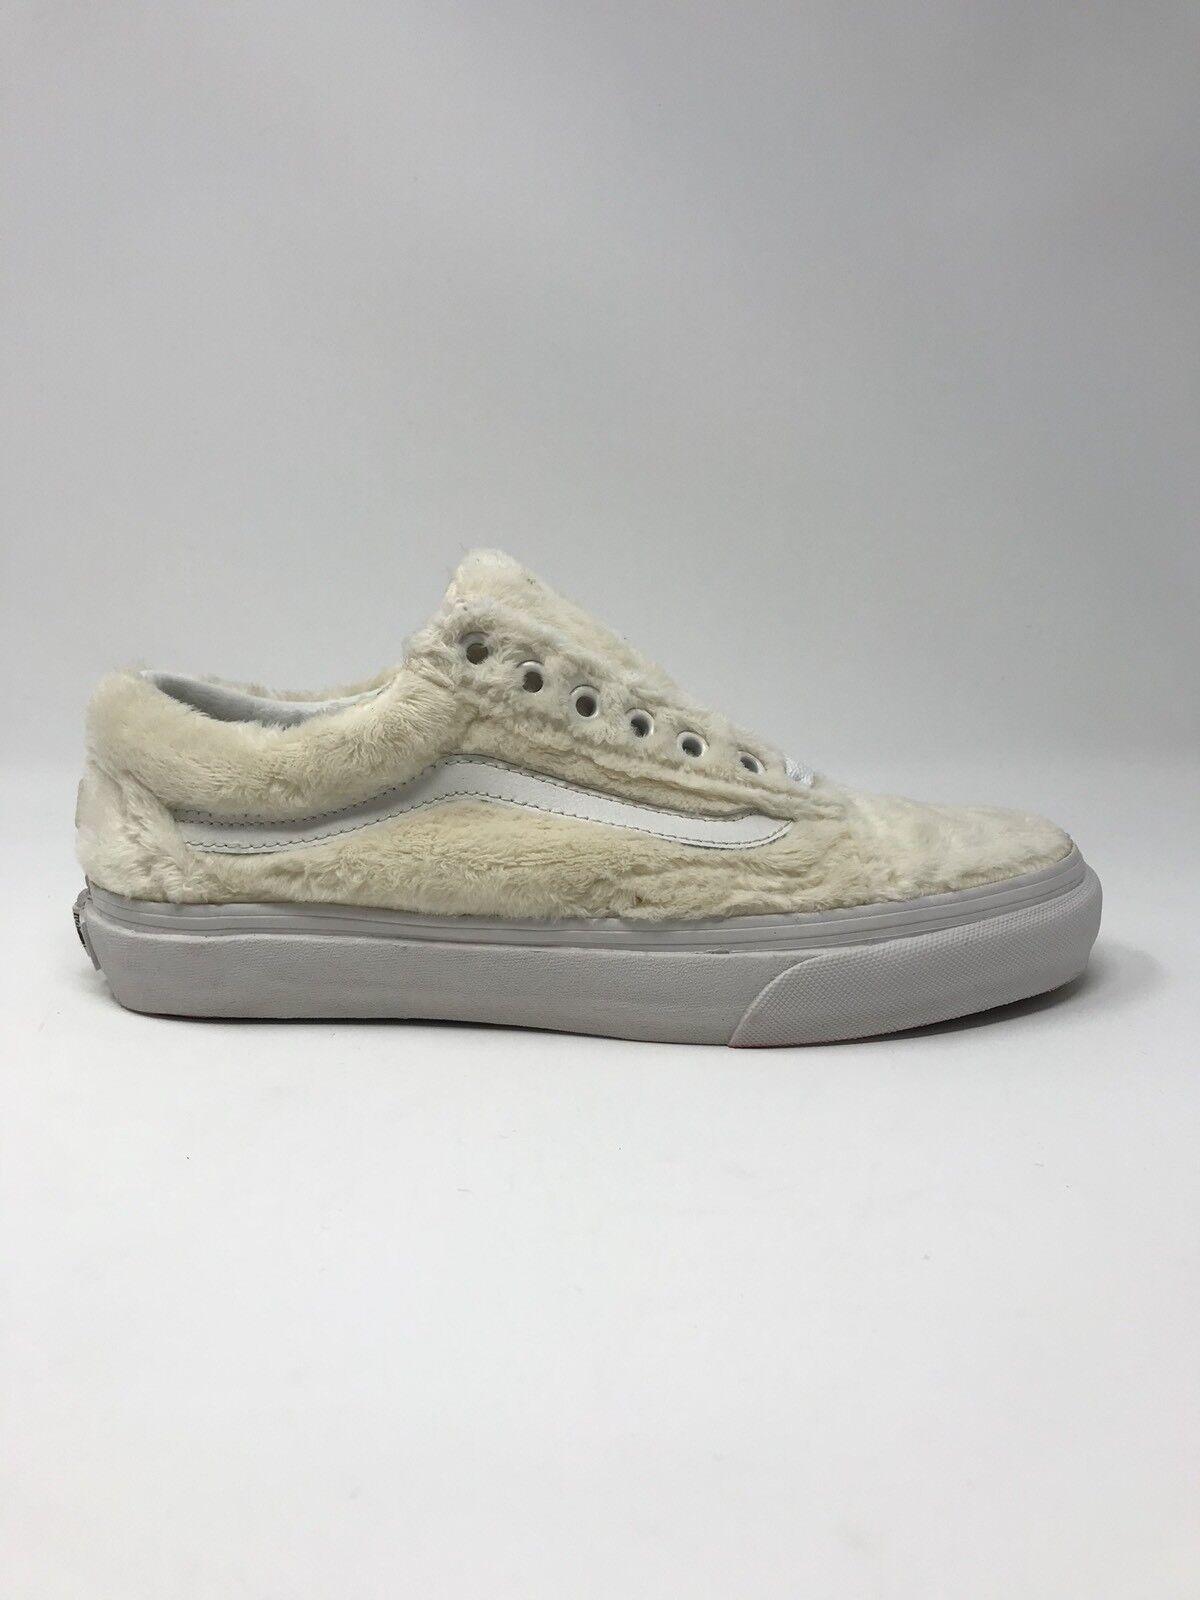 8ba02fb962d482 VANS Old Skool Sherpa Turtledove Women s Skate Shoes Size 8.5 for sale  online